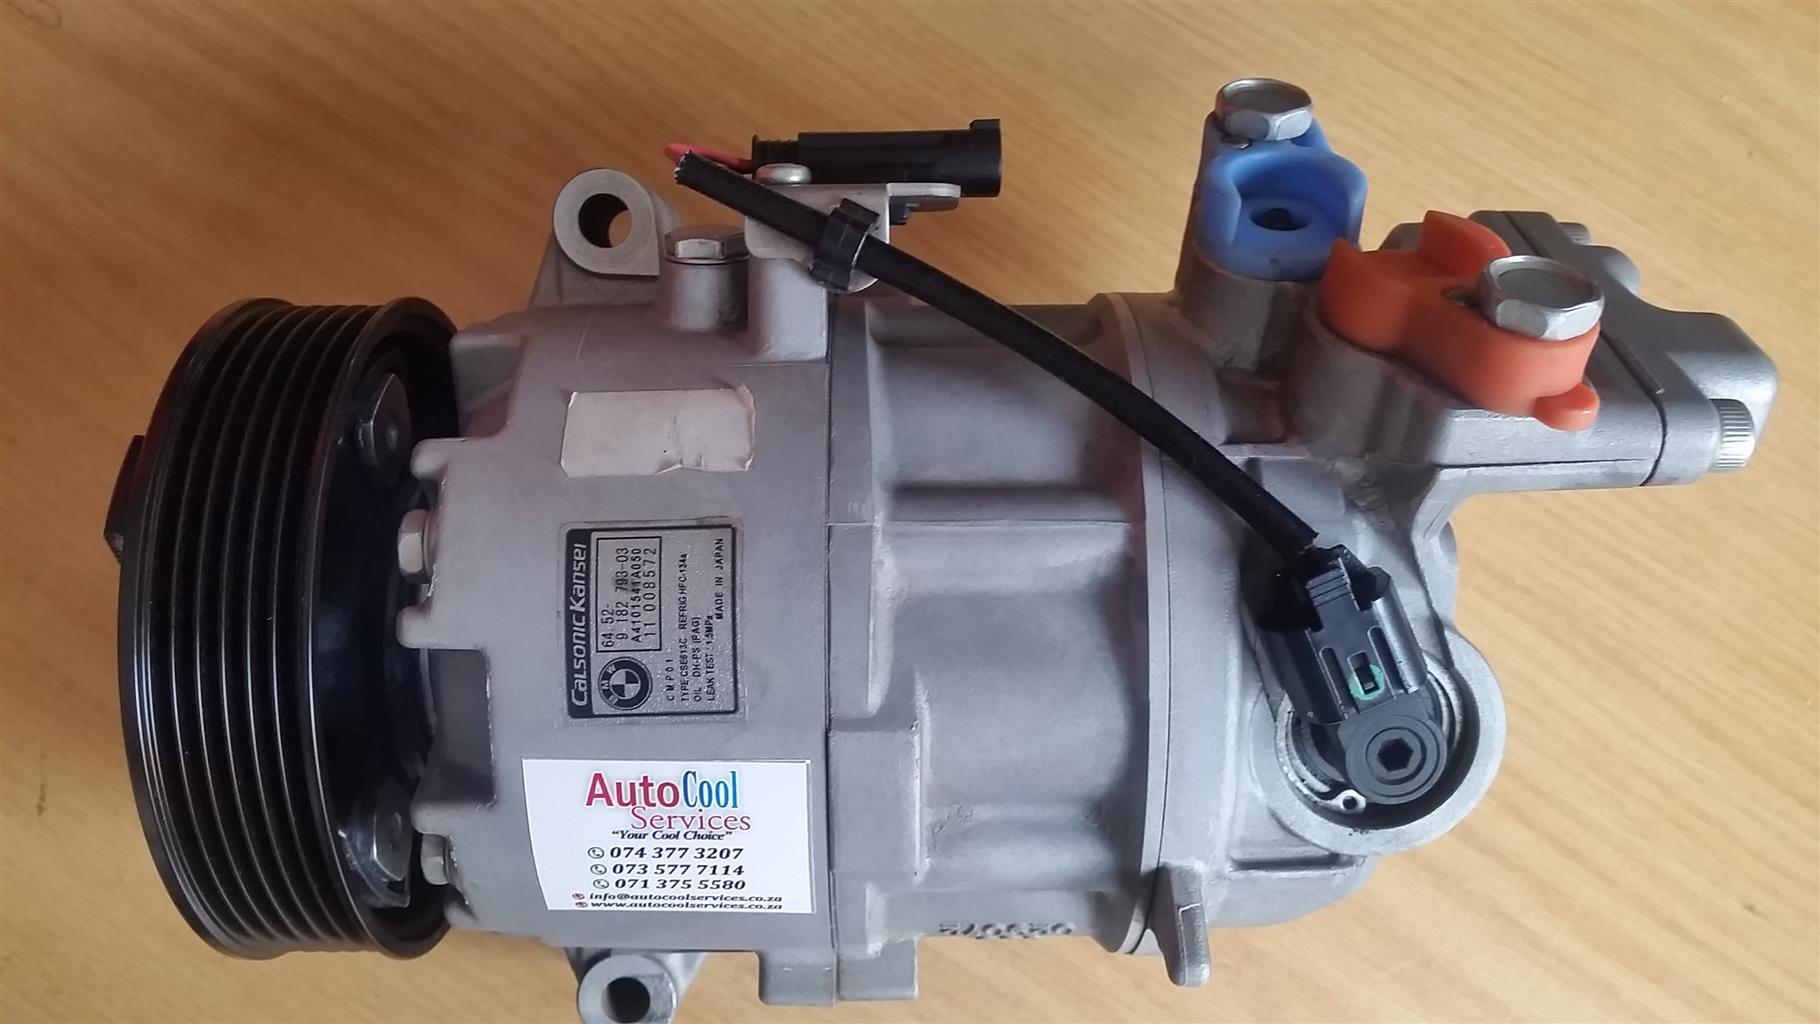 Automotive Aircon Components